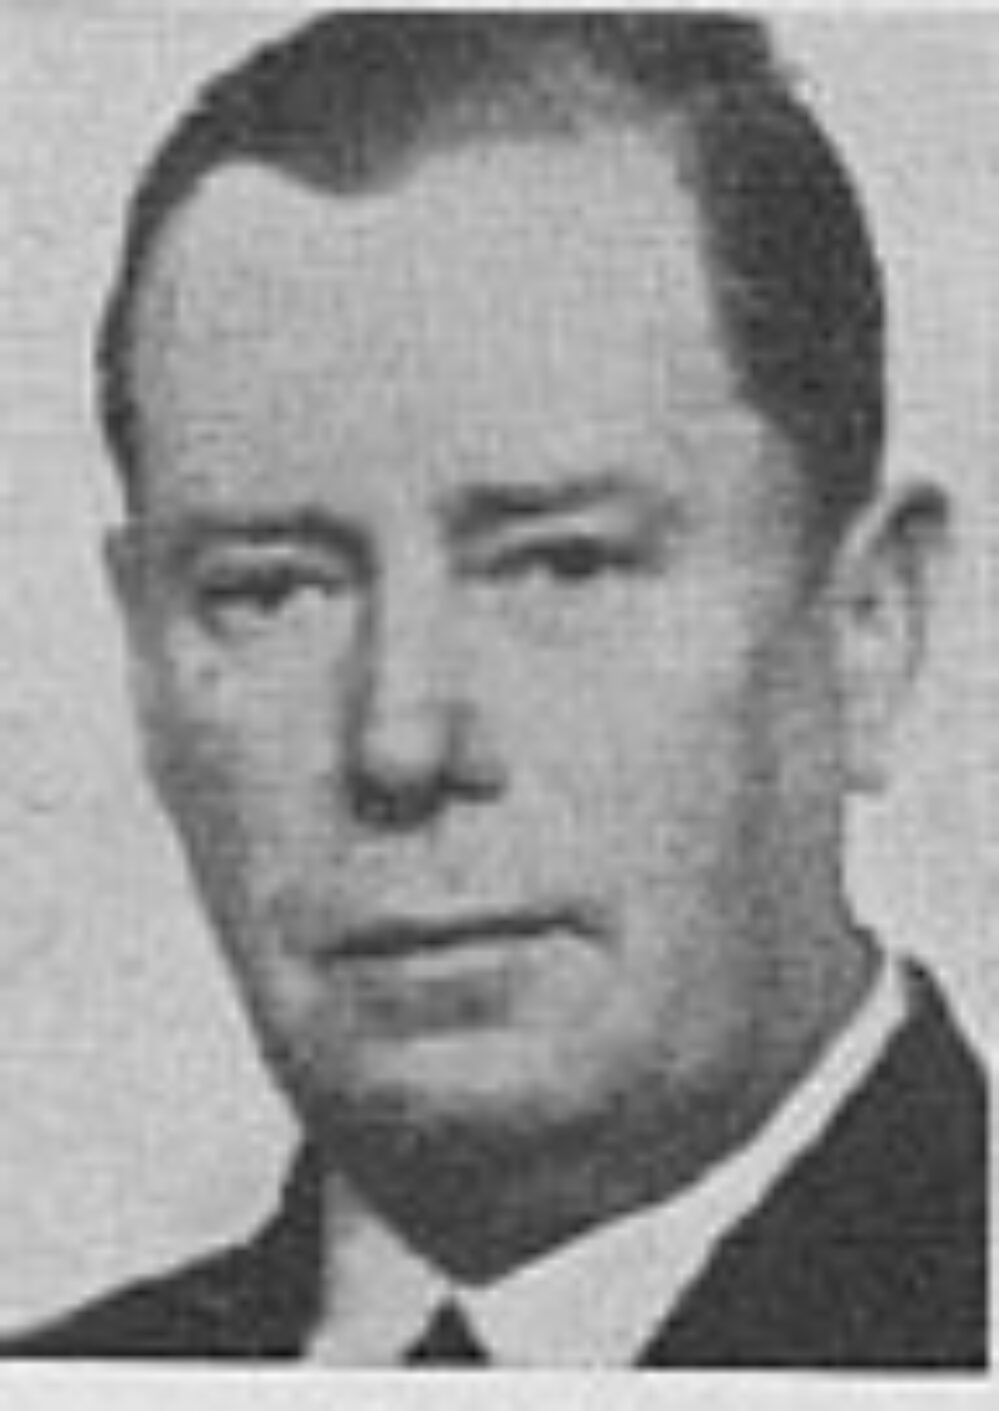 Harald Myking